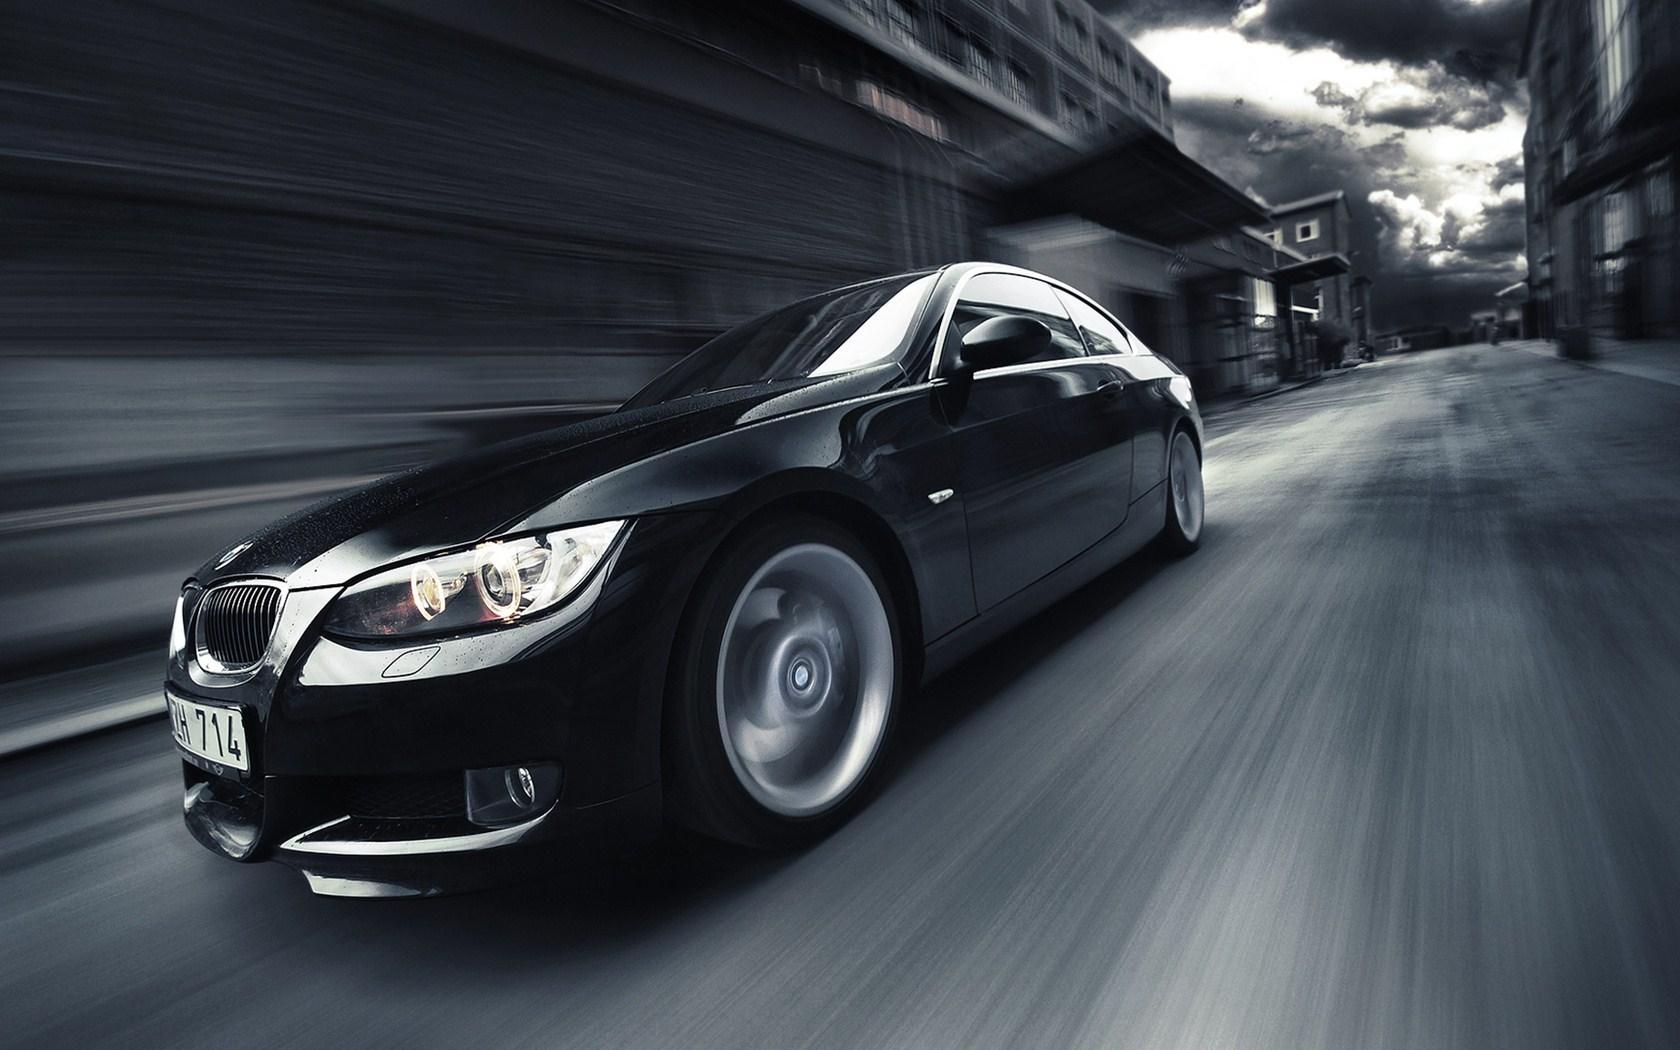 Black BMW 335 Street Speed Photo